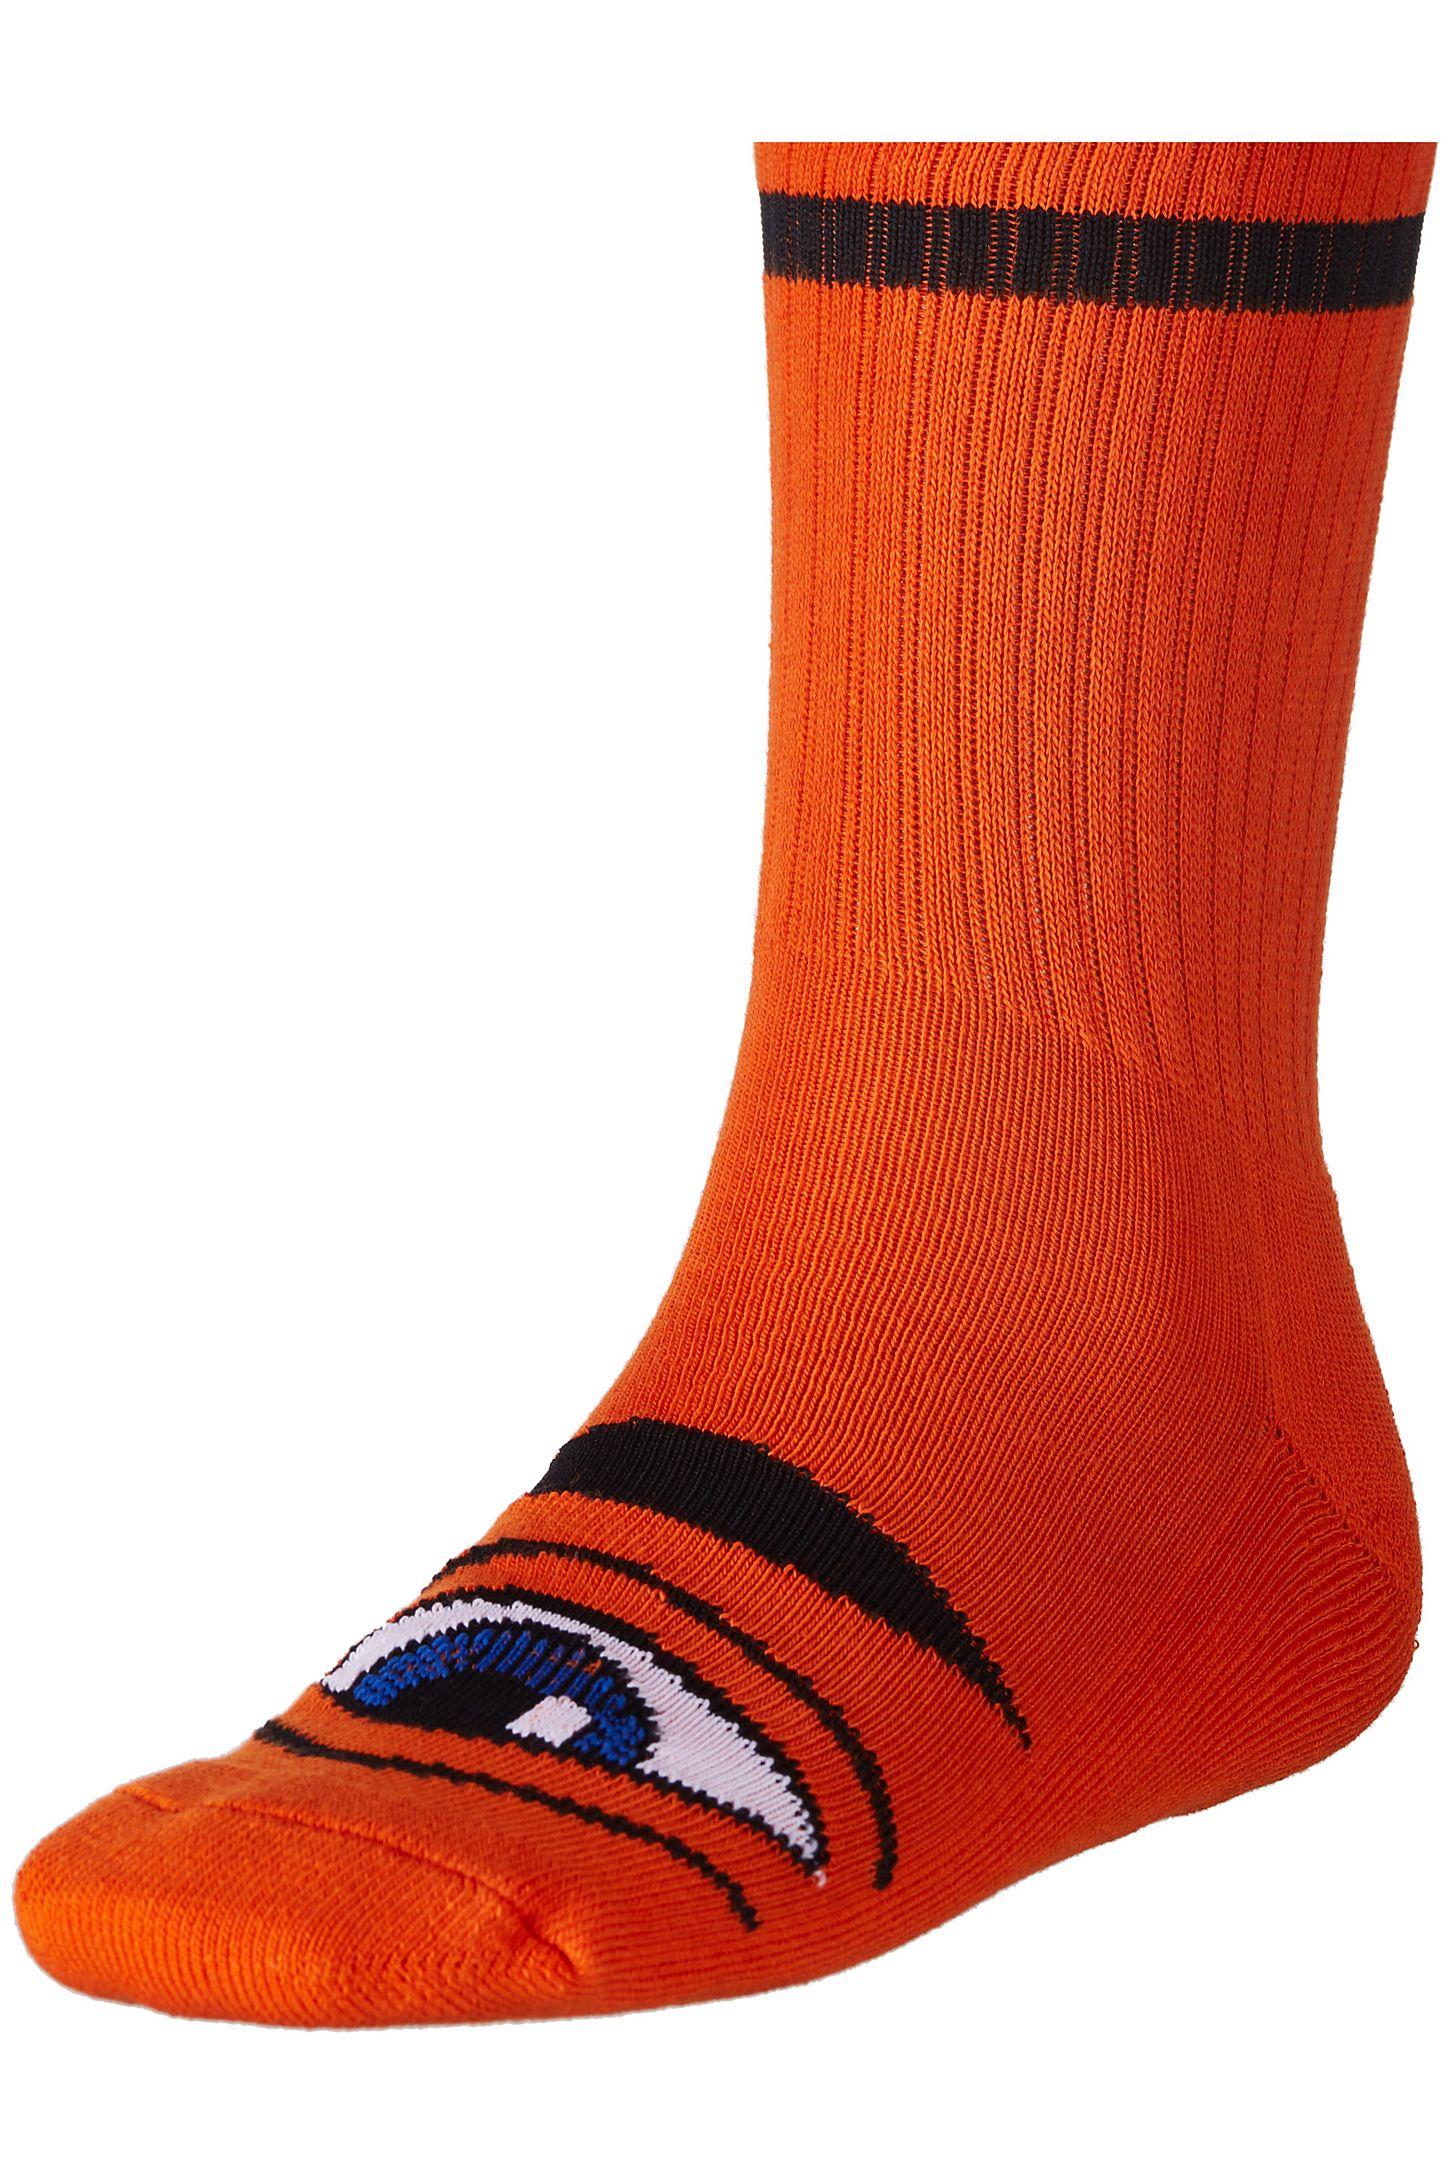 Toy Machine Sect Eye Iii Crew Socks Urban Outfitters Deck Orange Slide View 2